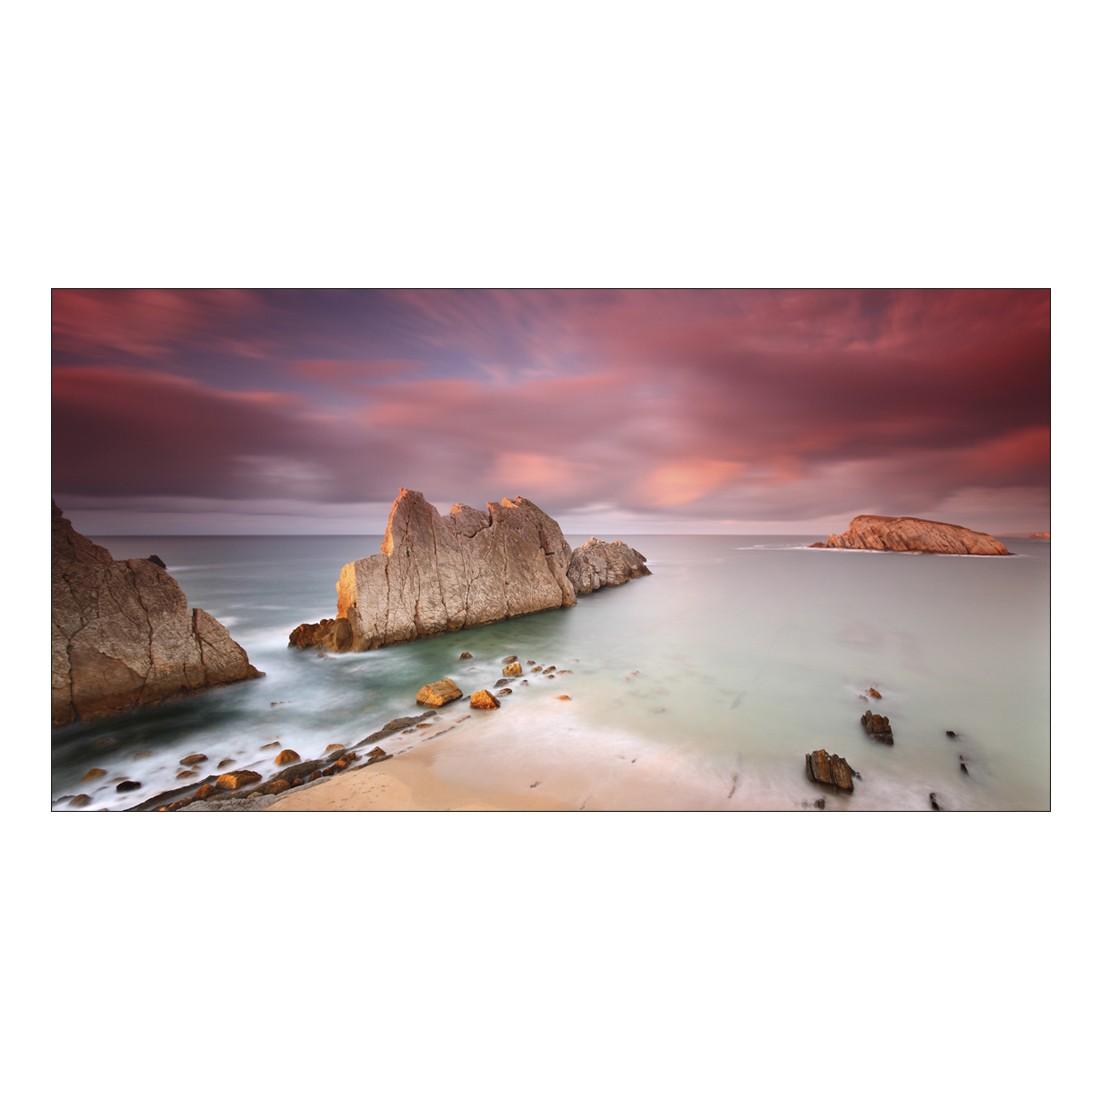 Leinwandbild WHITE ROCK FORMATION AT BEACH – Abmessung 100 x 75 cm, Gallery of Innovative Art kaufen